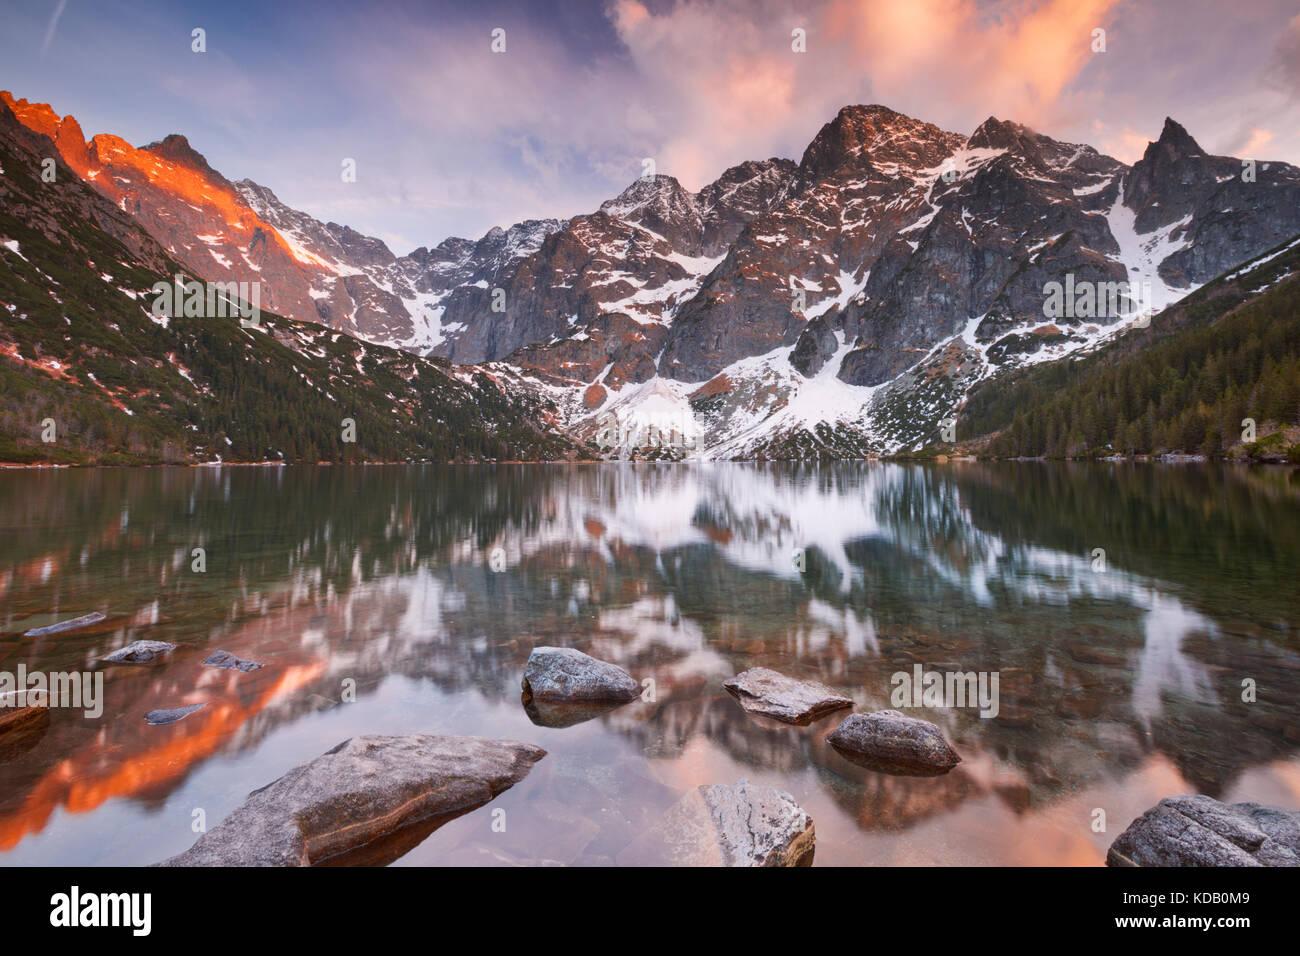 Die Morskie Oko See in den Bergen der Hohen Tatra in Polen, bei Sonnenuntergang fotografiert. Stockbild